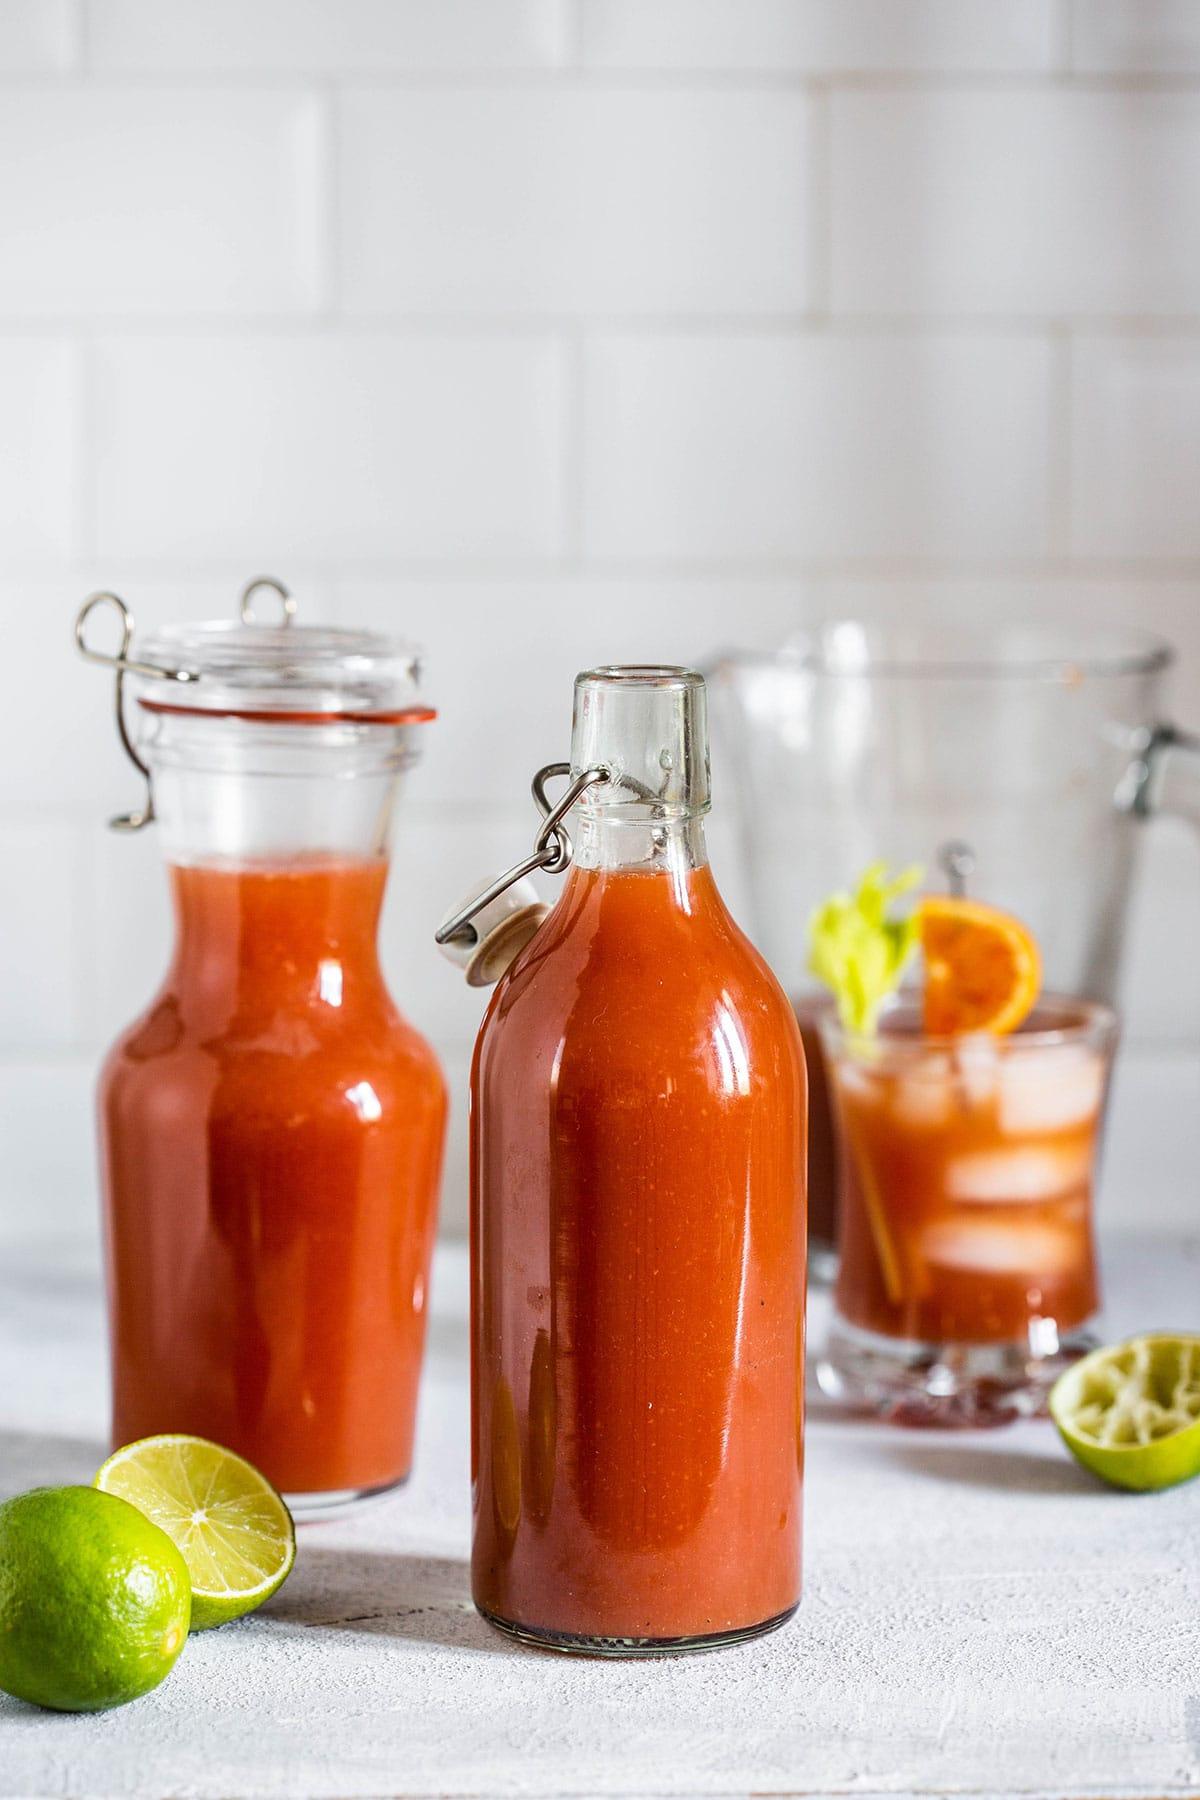 Bottles containing homemade Clamato juice.